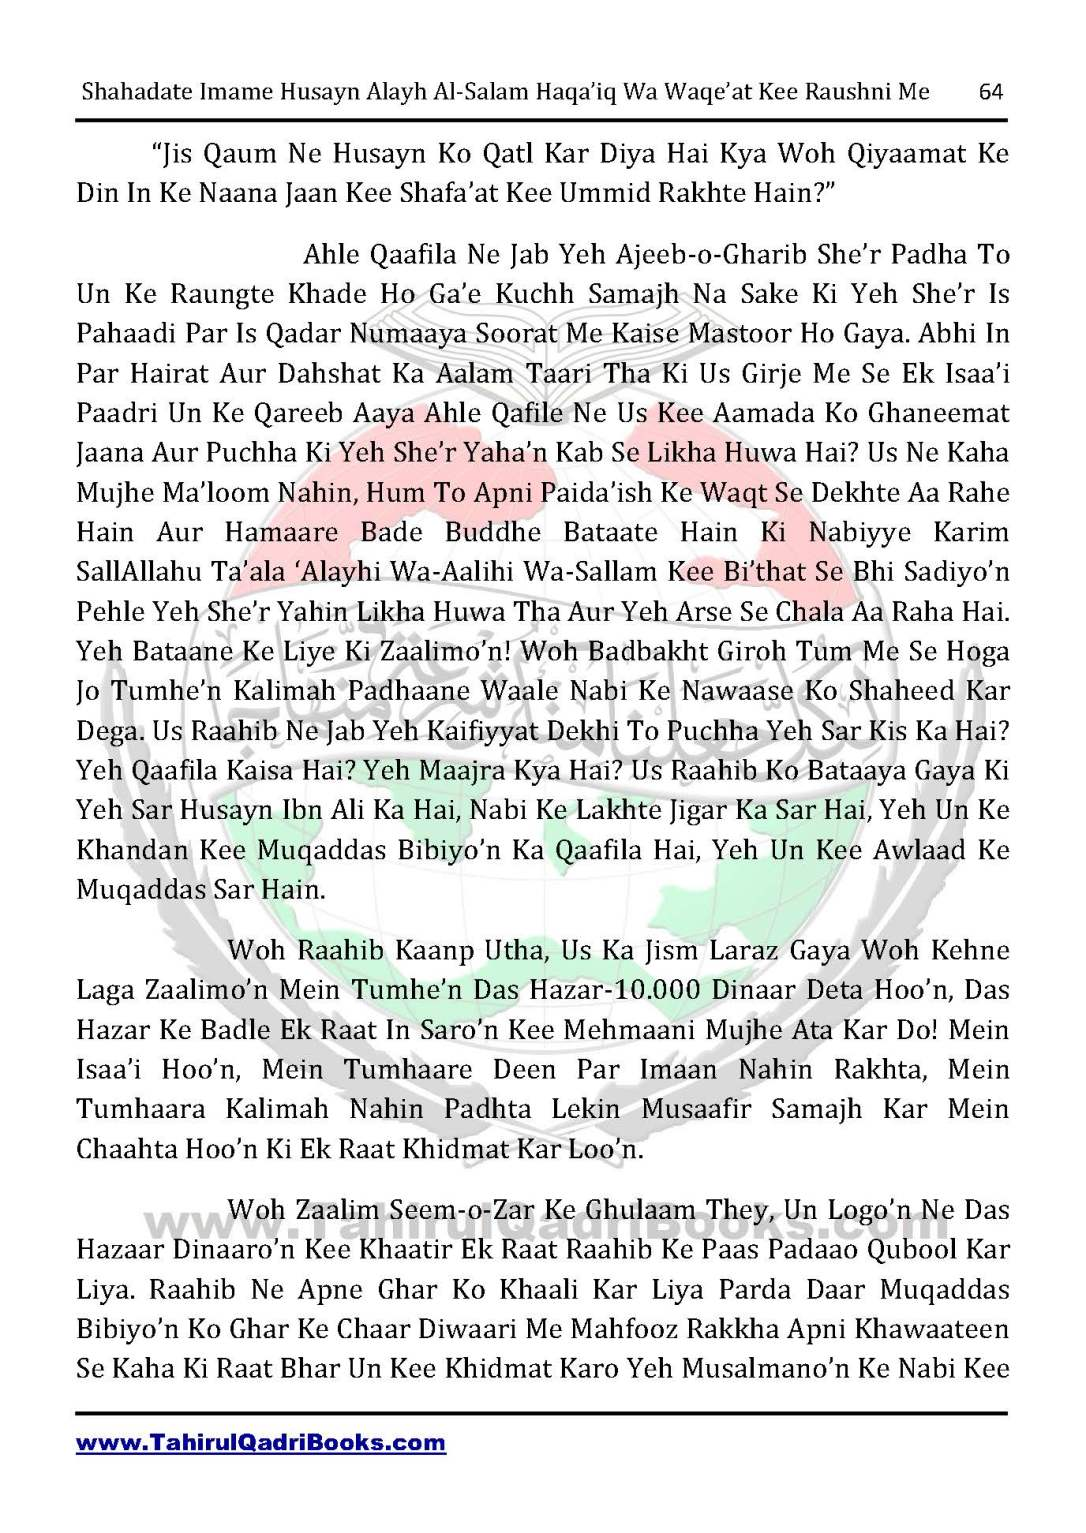 shahadate-imame-husayn-alayh-is-salam-haqaiq-wa-waqe_at-kee-raushni-me-in-roman-urdu-unlocked_Page_64